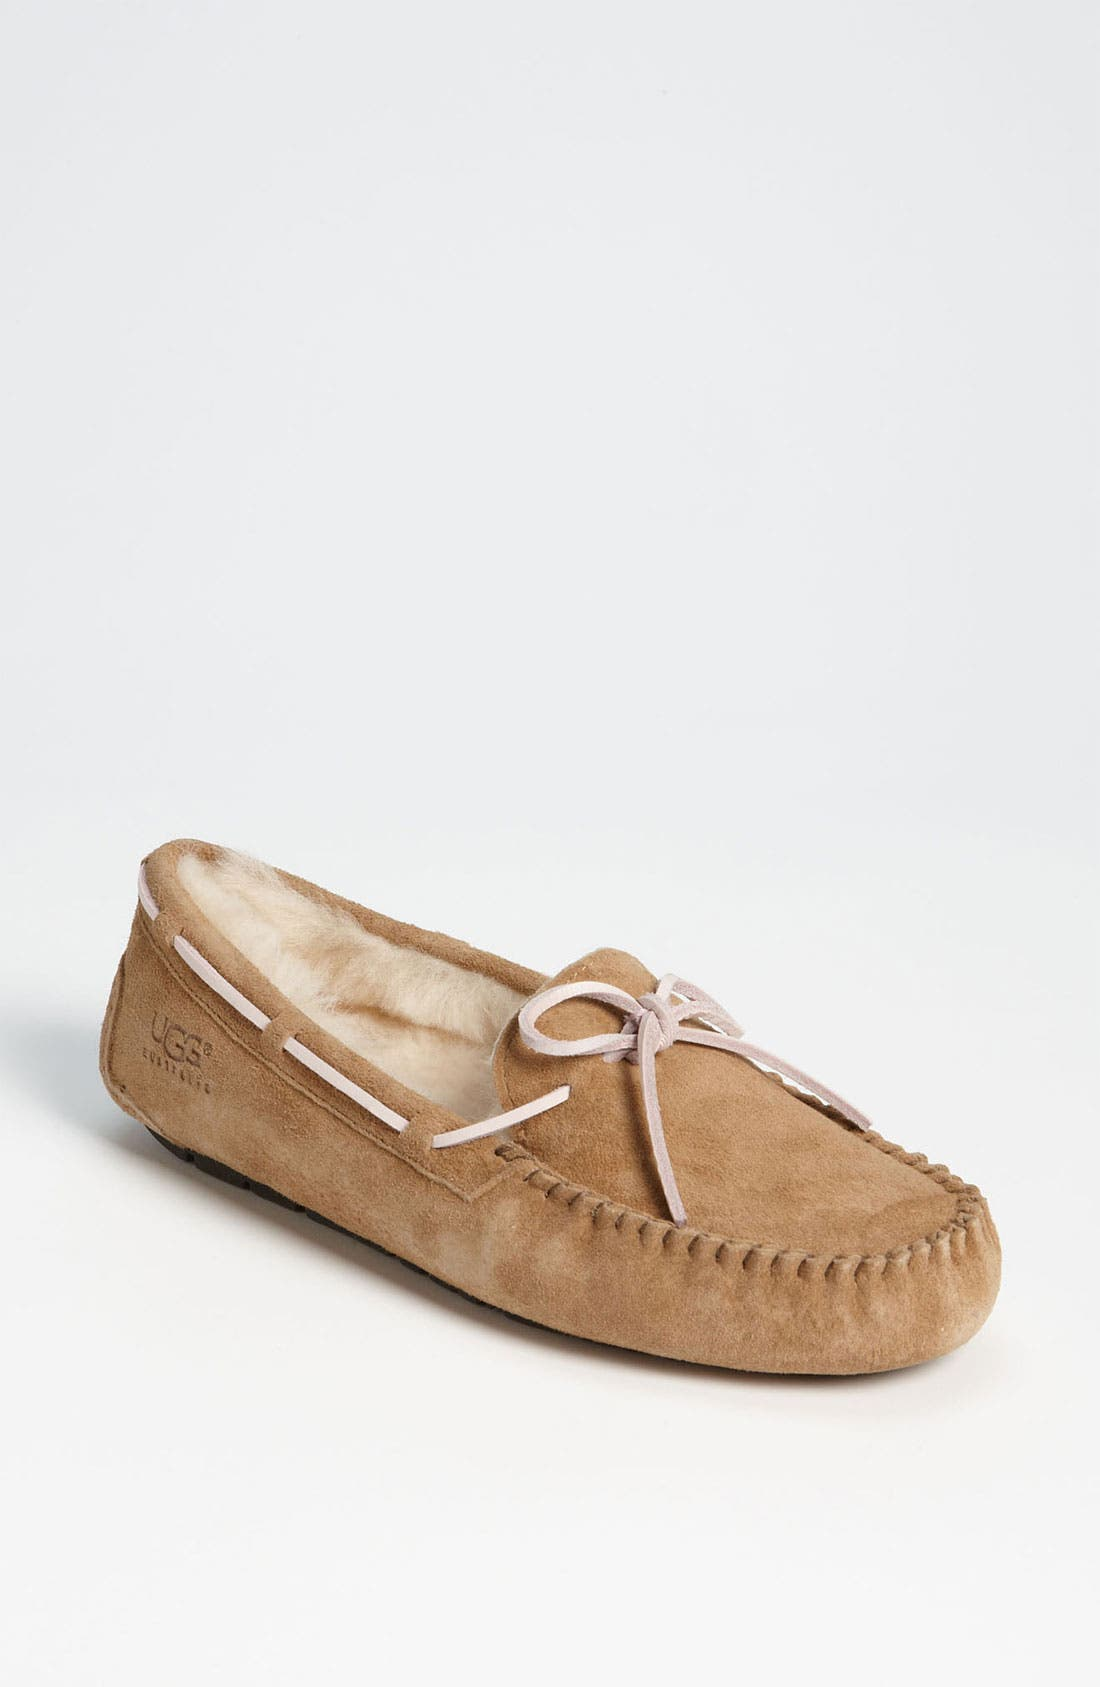 Ugg Dakota Water Resistant Slipper, Beige